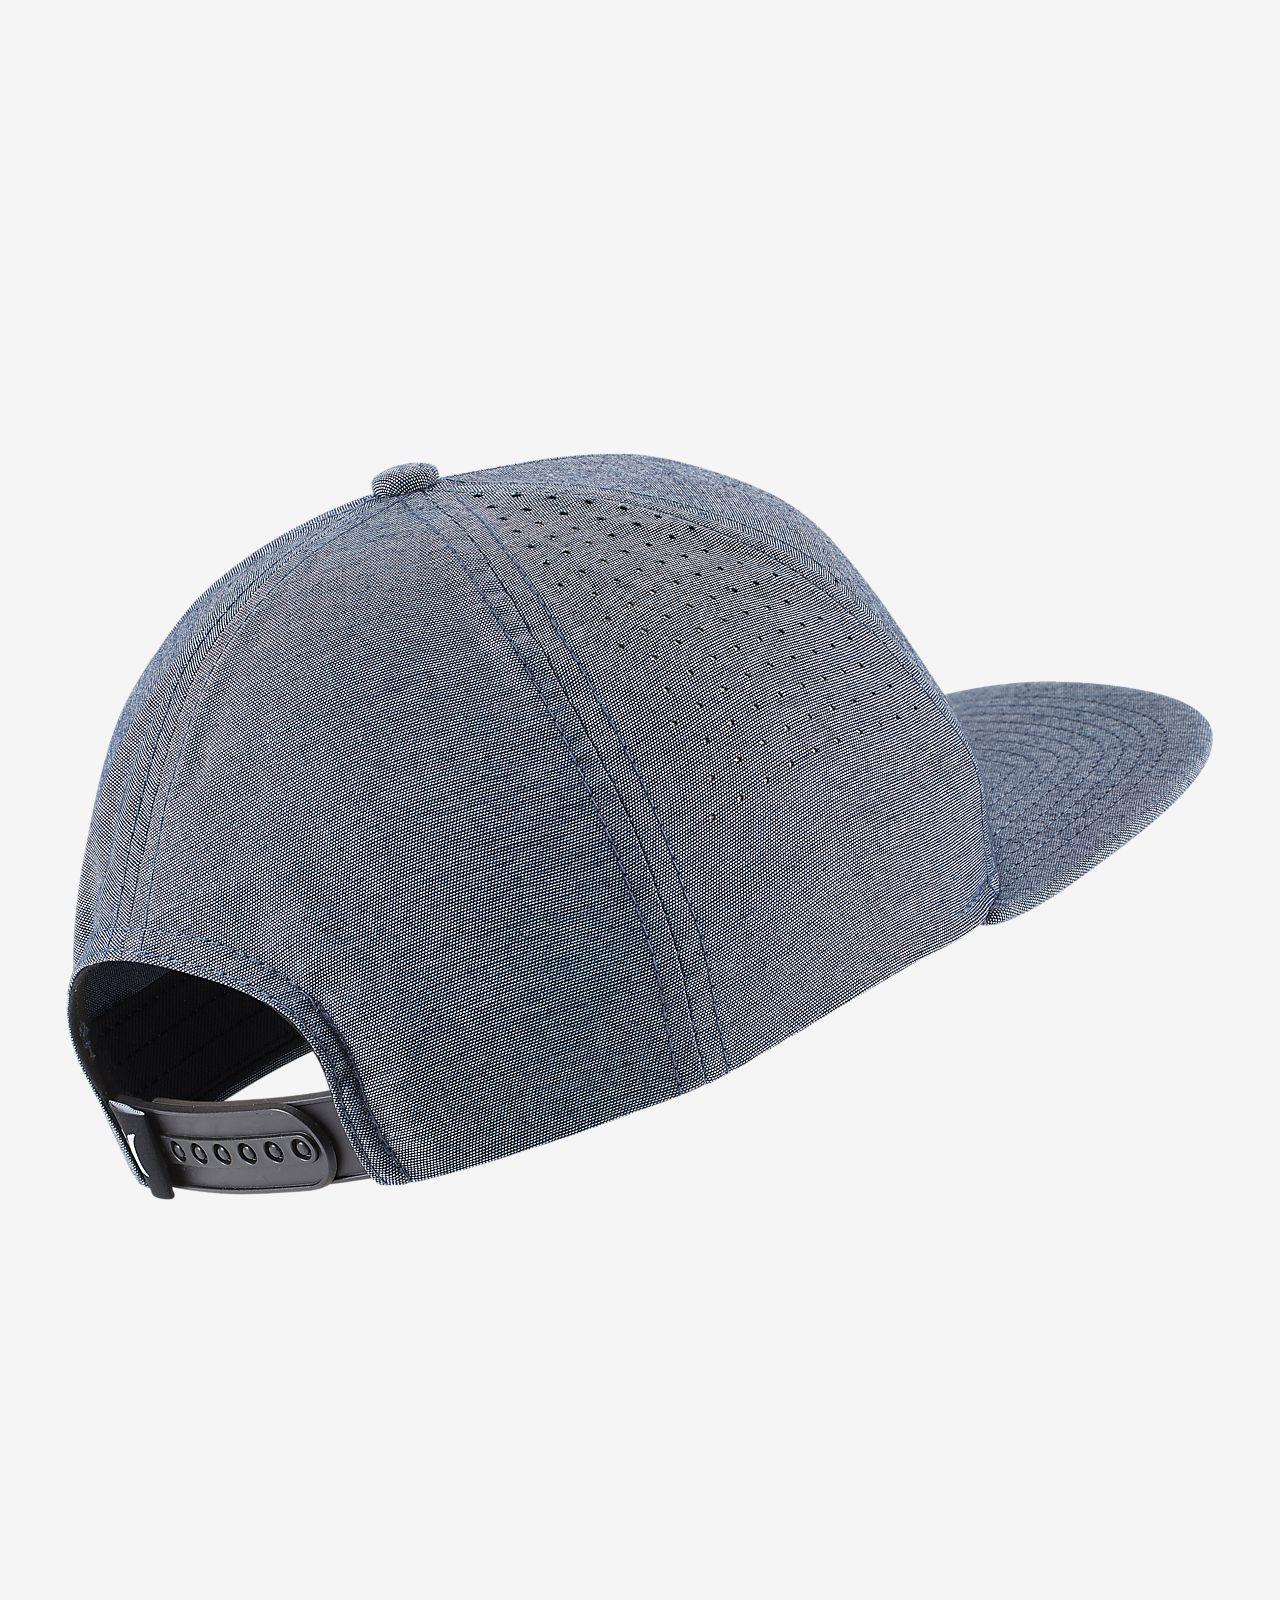 73b4117e3898 Hurley Dri-FIT Staple Adjustable Hat. Nike.com